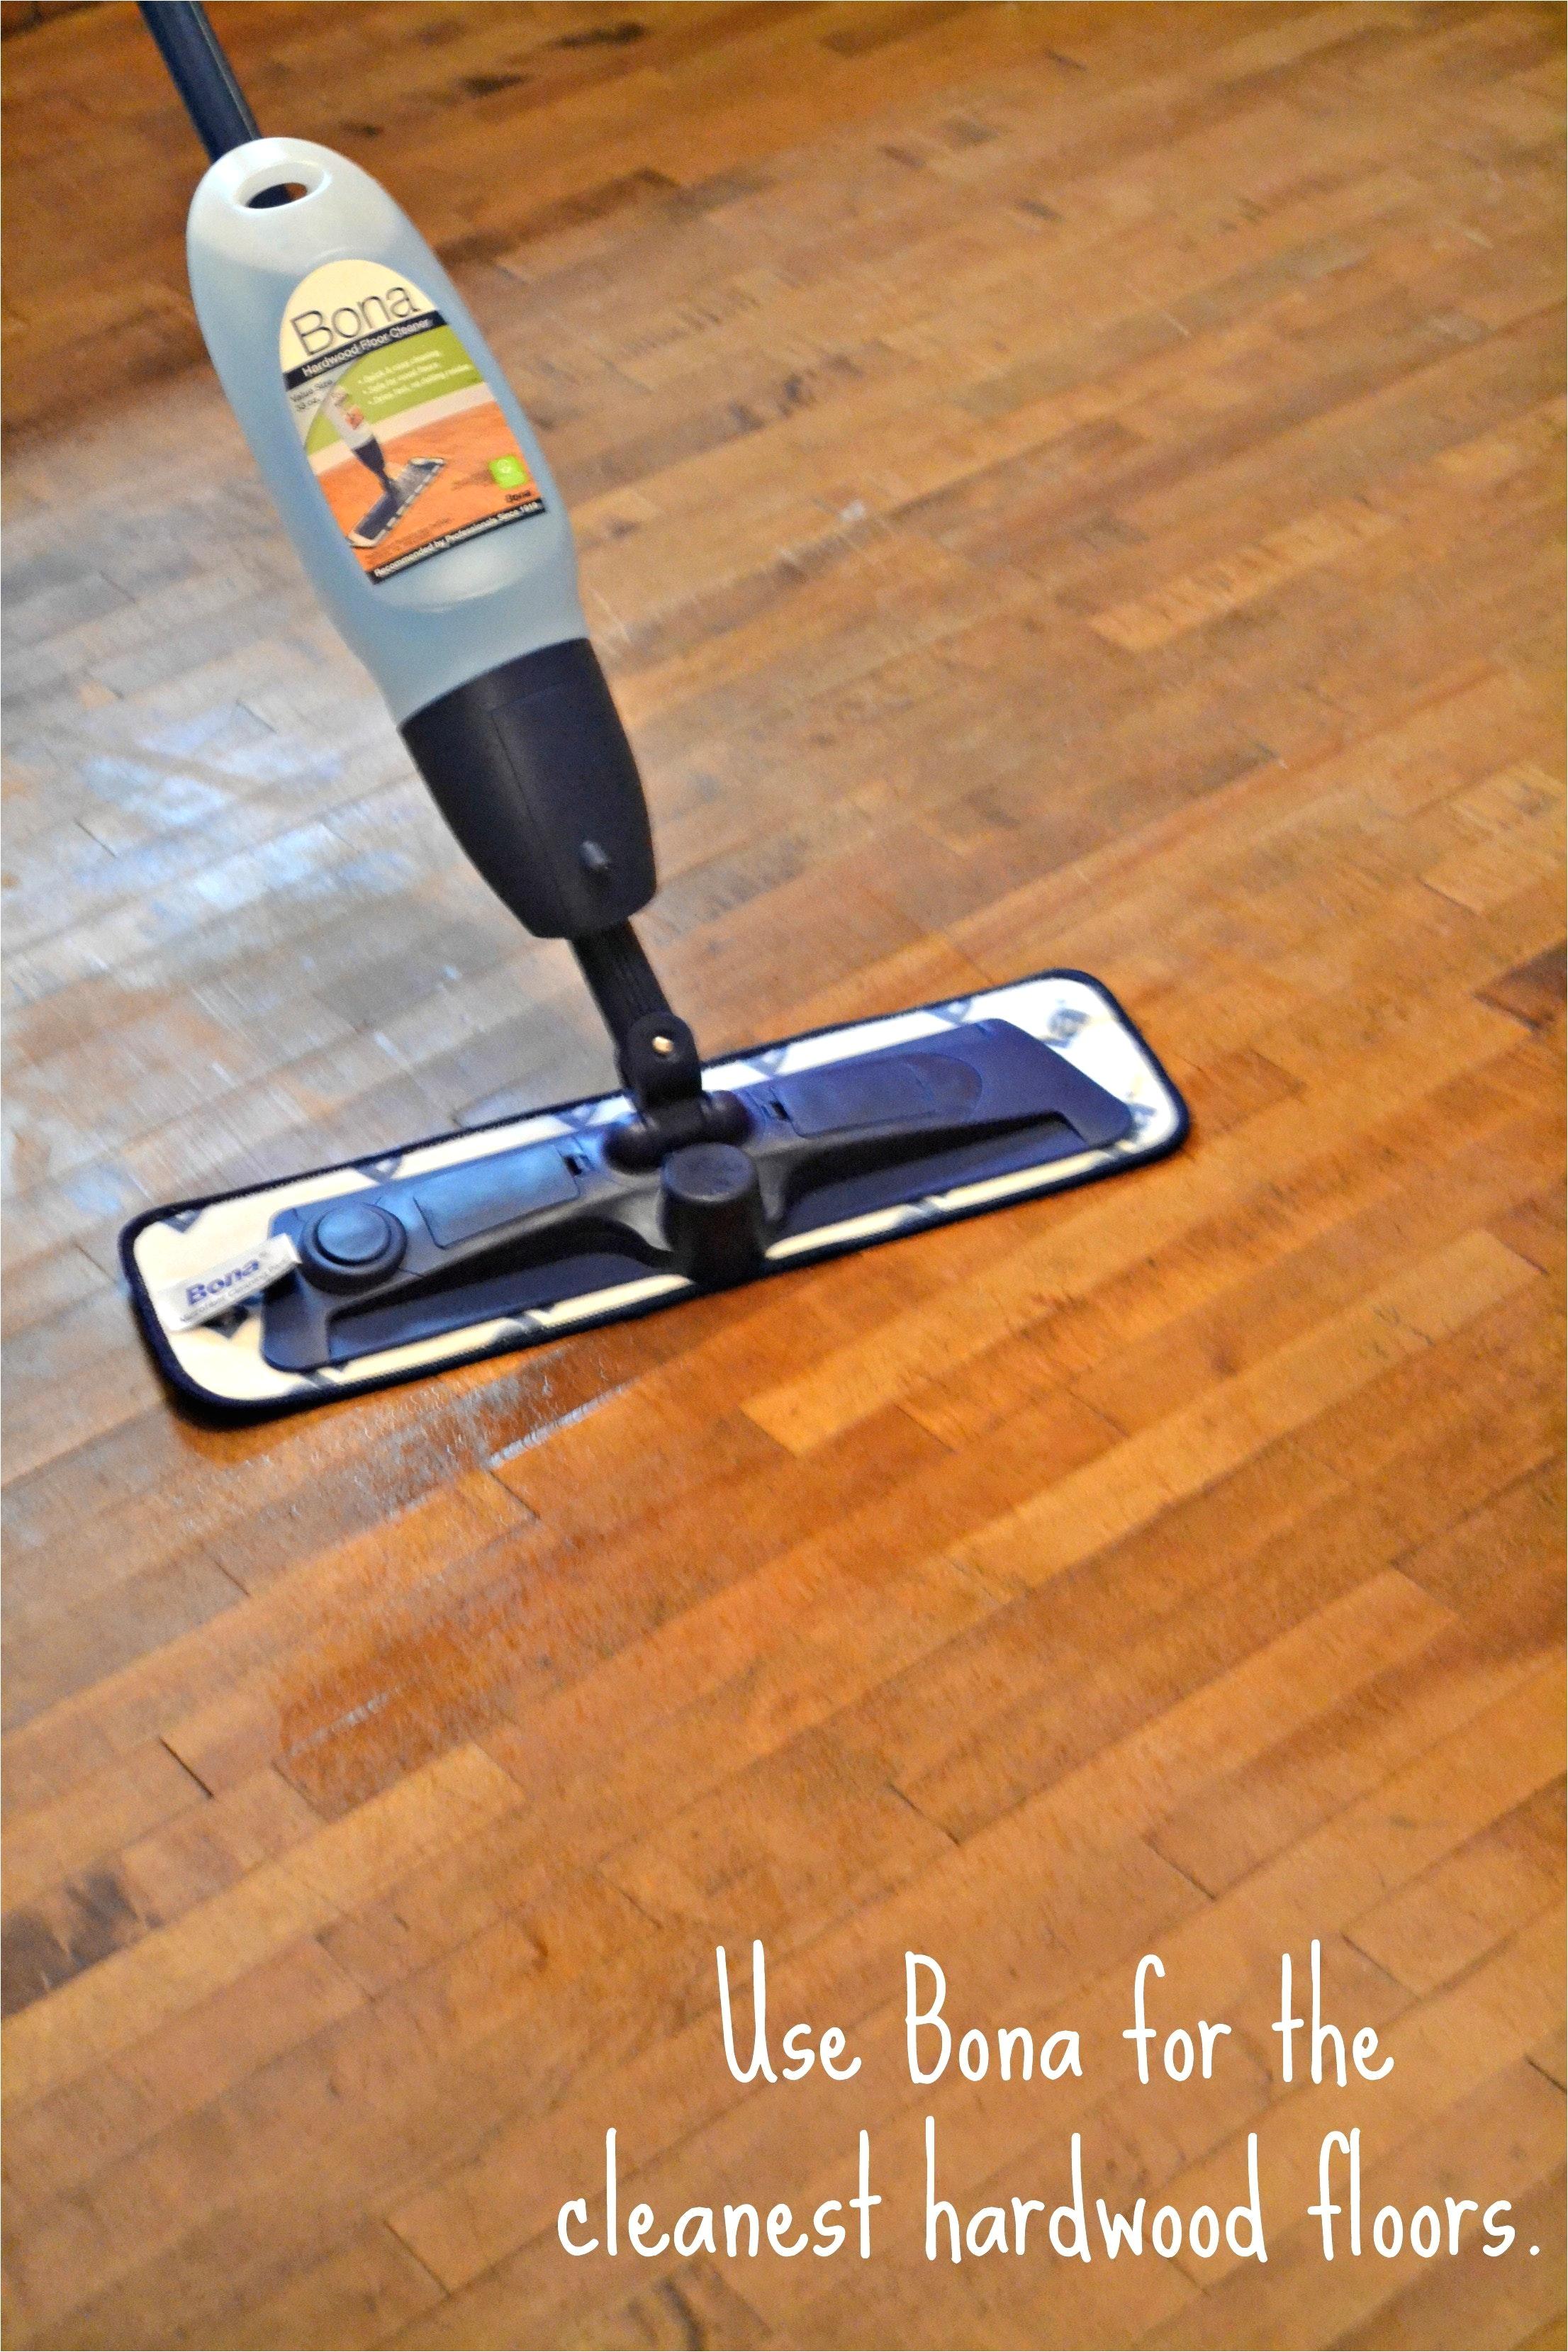 Shark Hardwood Floor Cleaner Costco Hardwood Floor Cleaning Tile Cleaner Stainless Steel Sink Cleaner